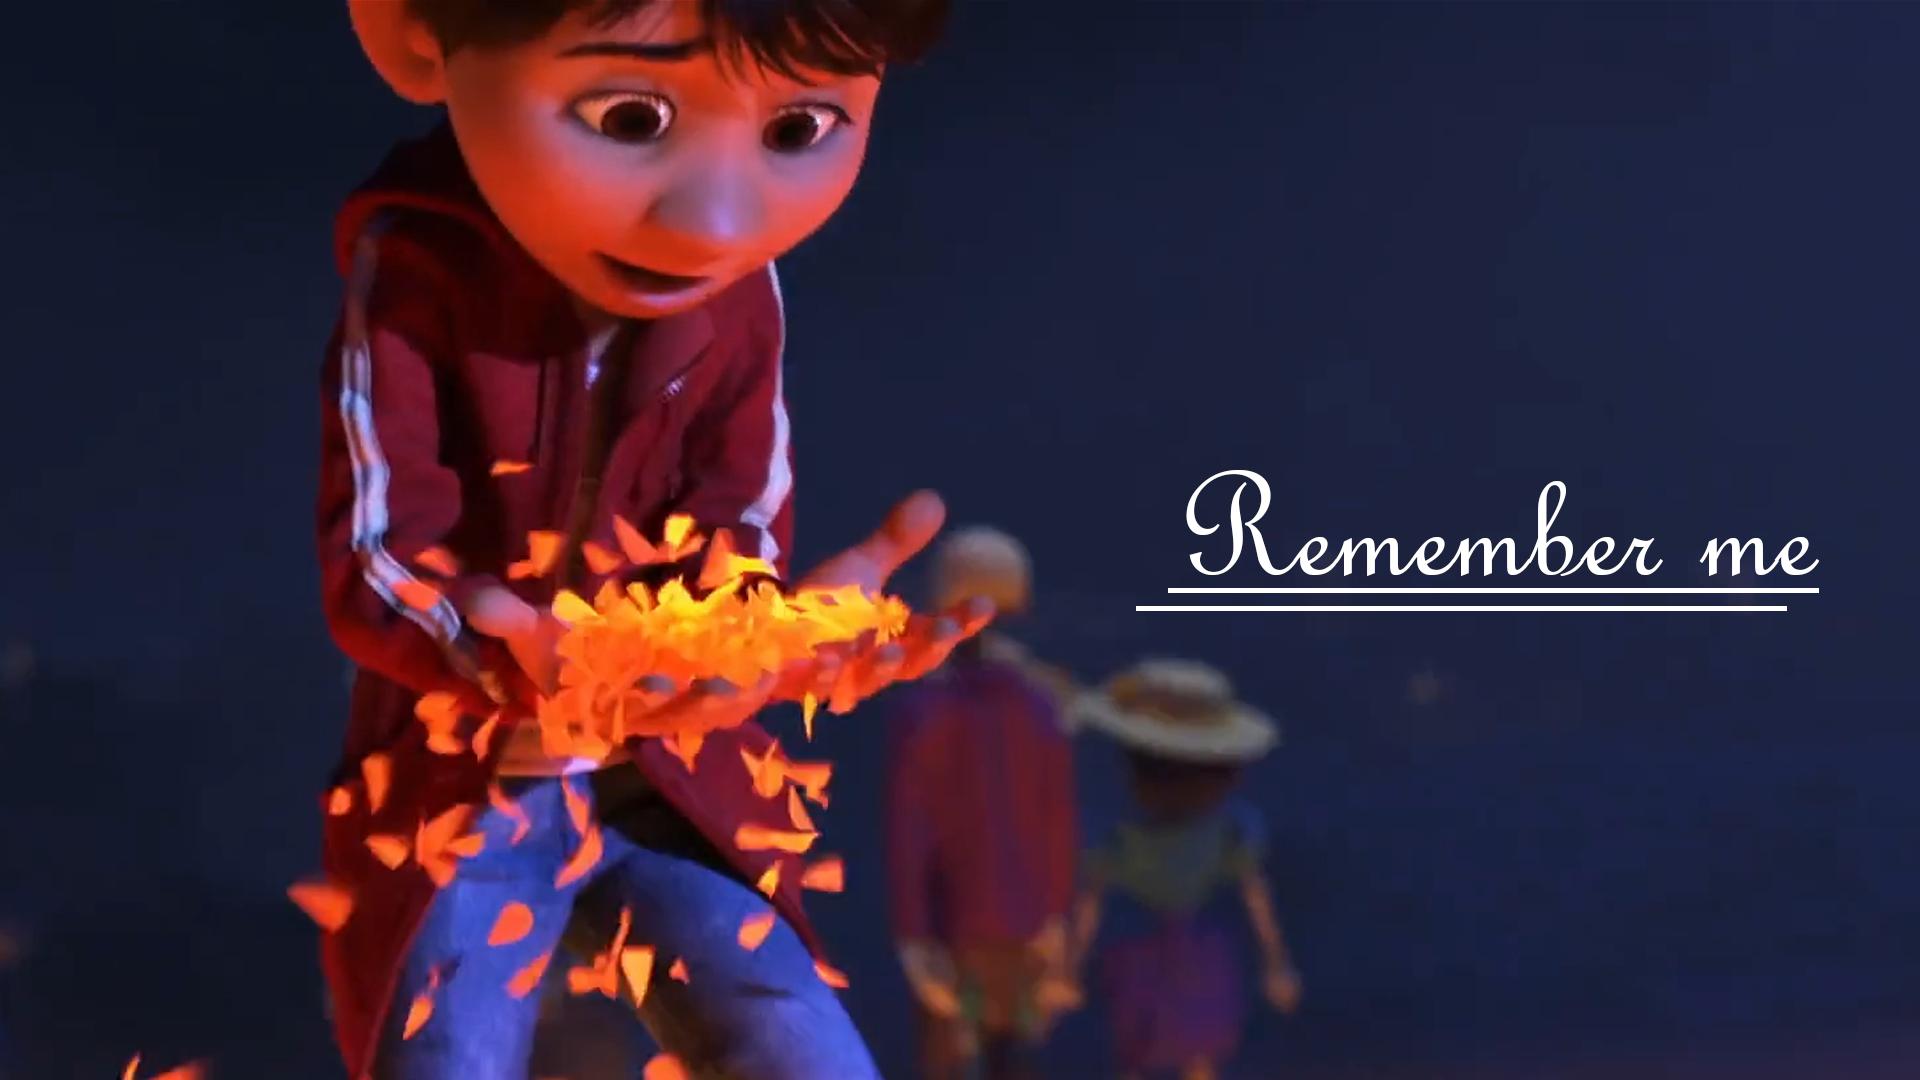 Remember me - 蛋骨luyen - 5SING中国原创音